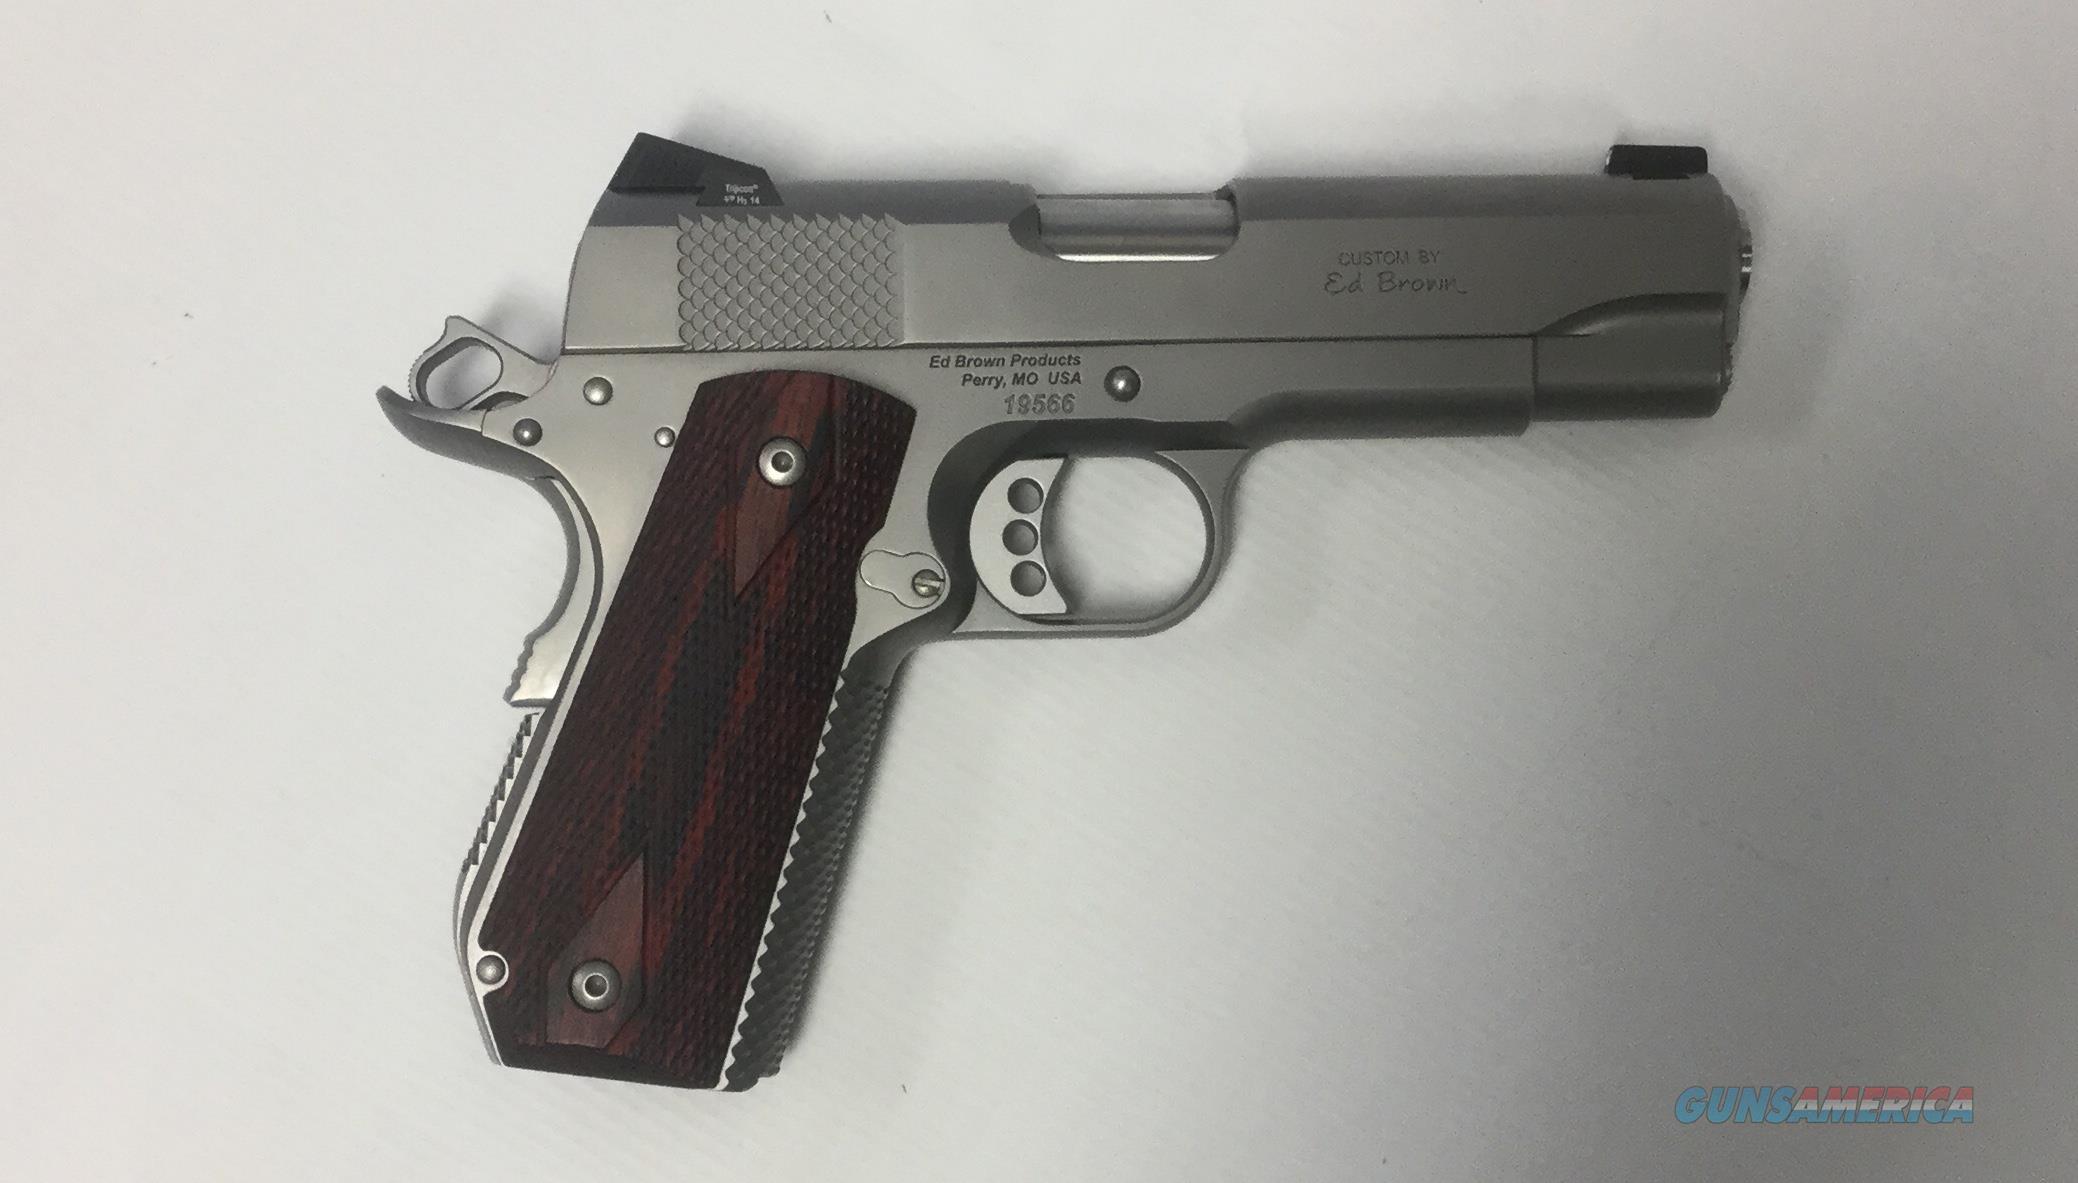 USED Ed Brown Kobra Carry 45acp  Guns > Pistols > Ed Brown Pistols